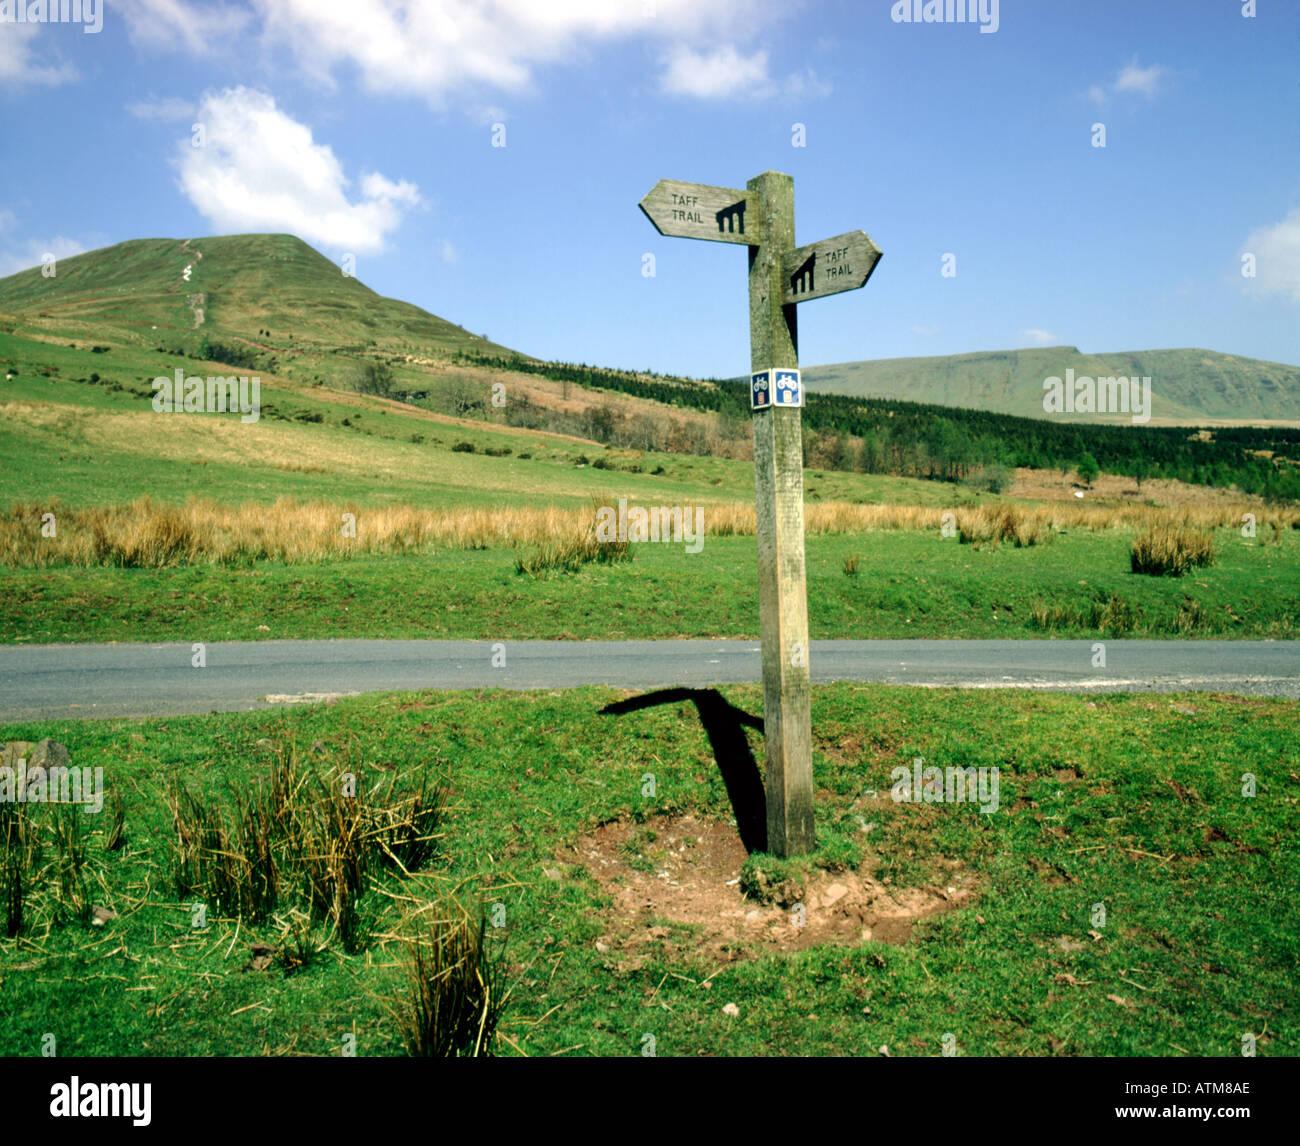 taff trail sign post torpantau brecon beacons national park wales - Stock Image